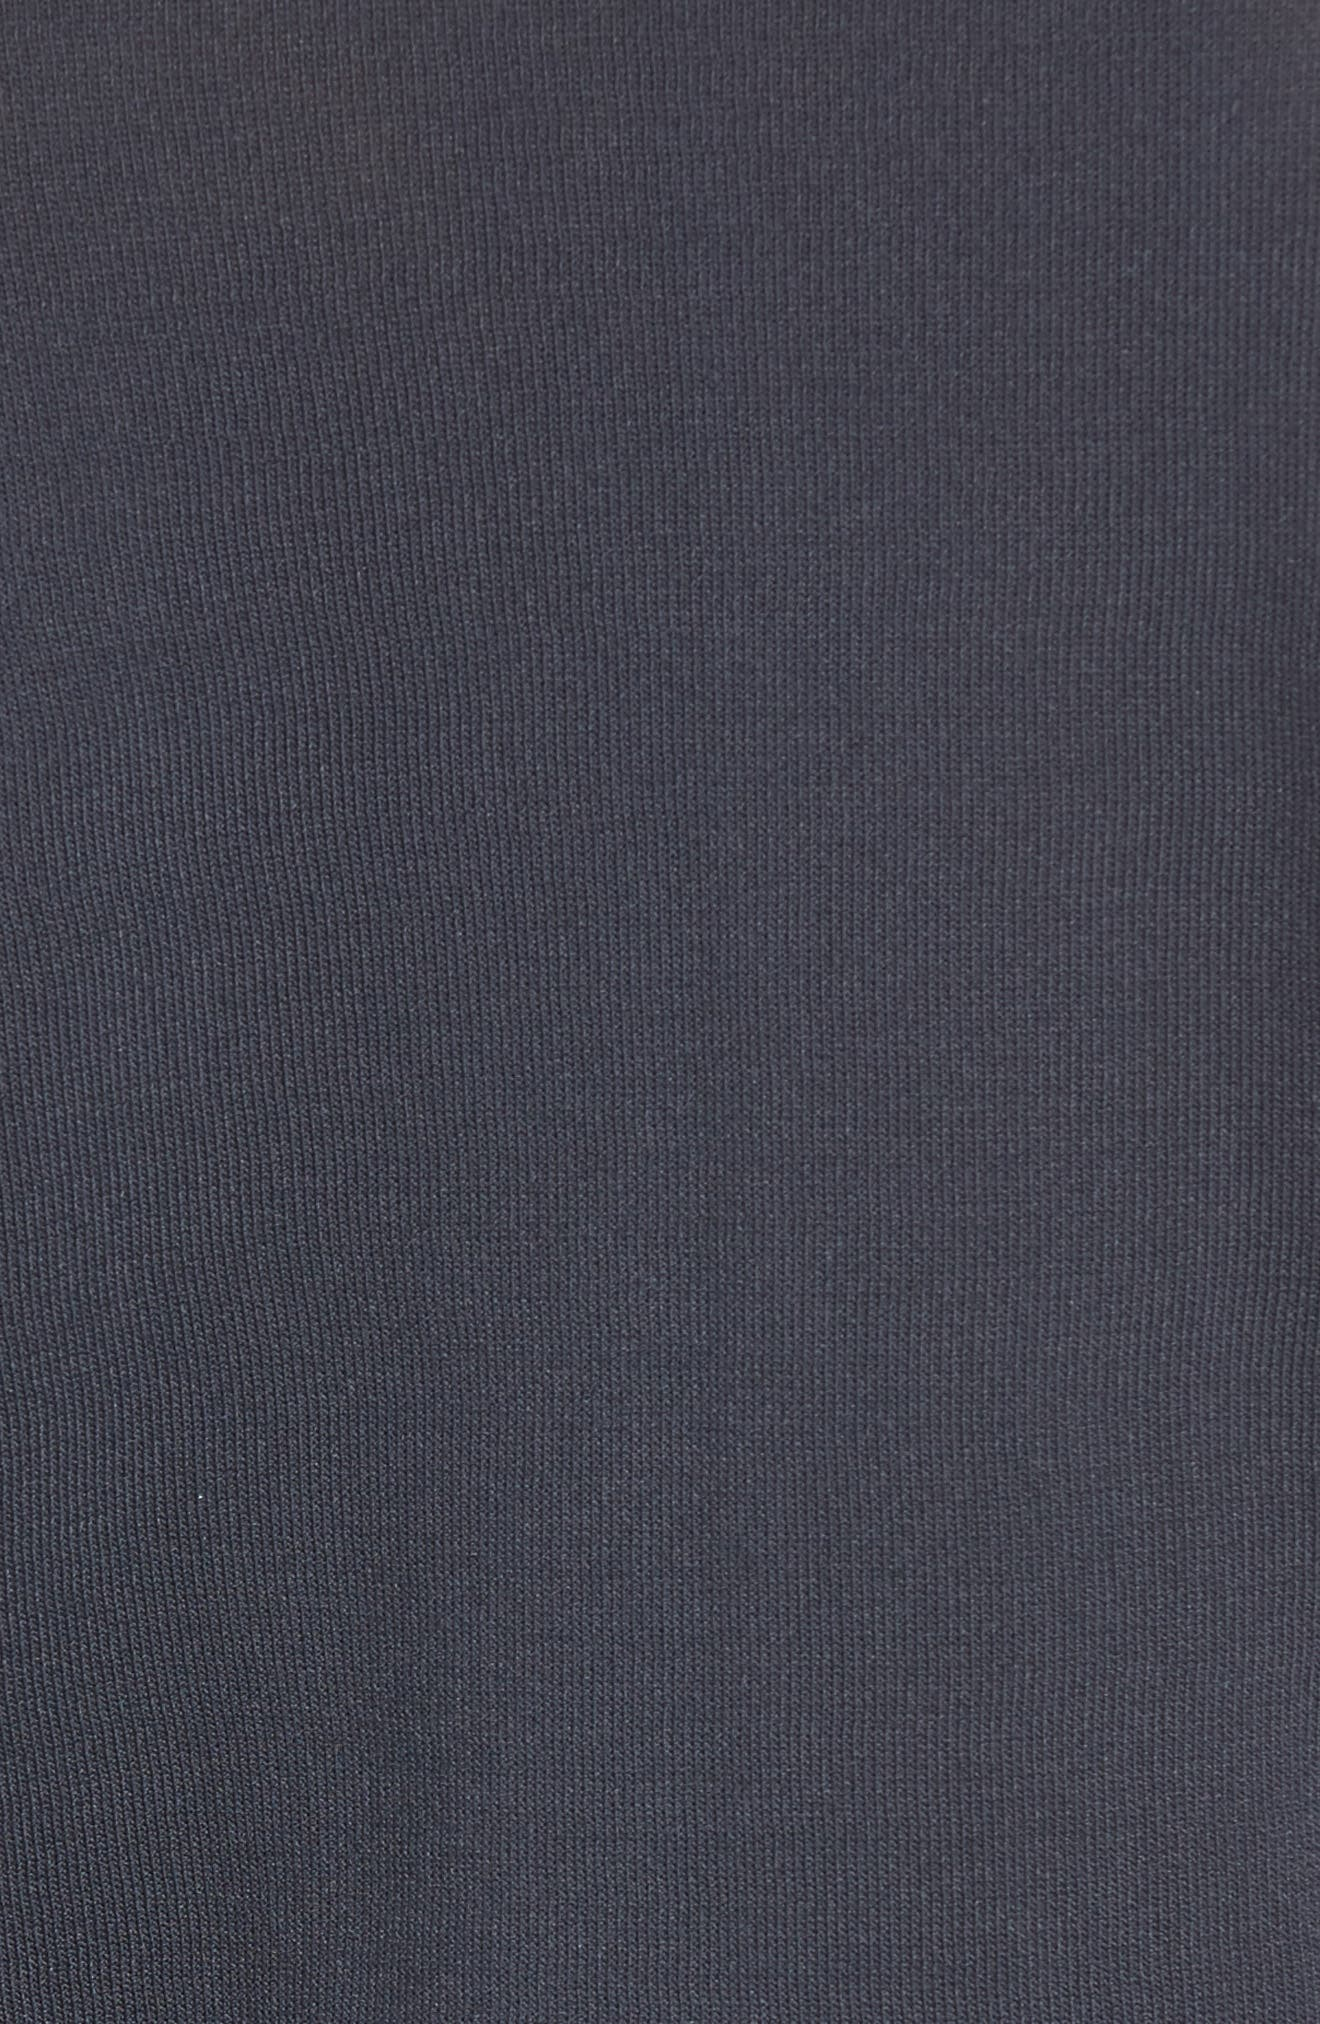 Alternate Image 5  - Leith Flare Cuff Sweater